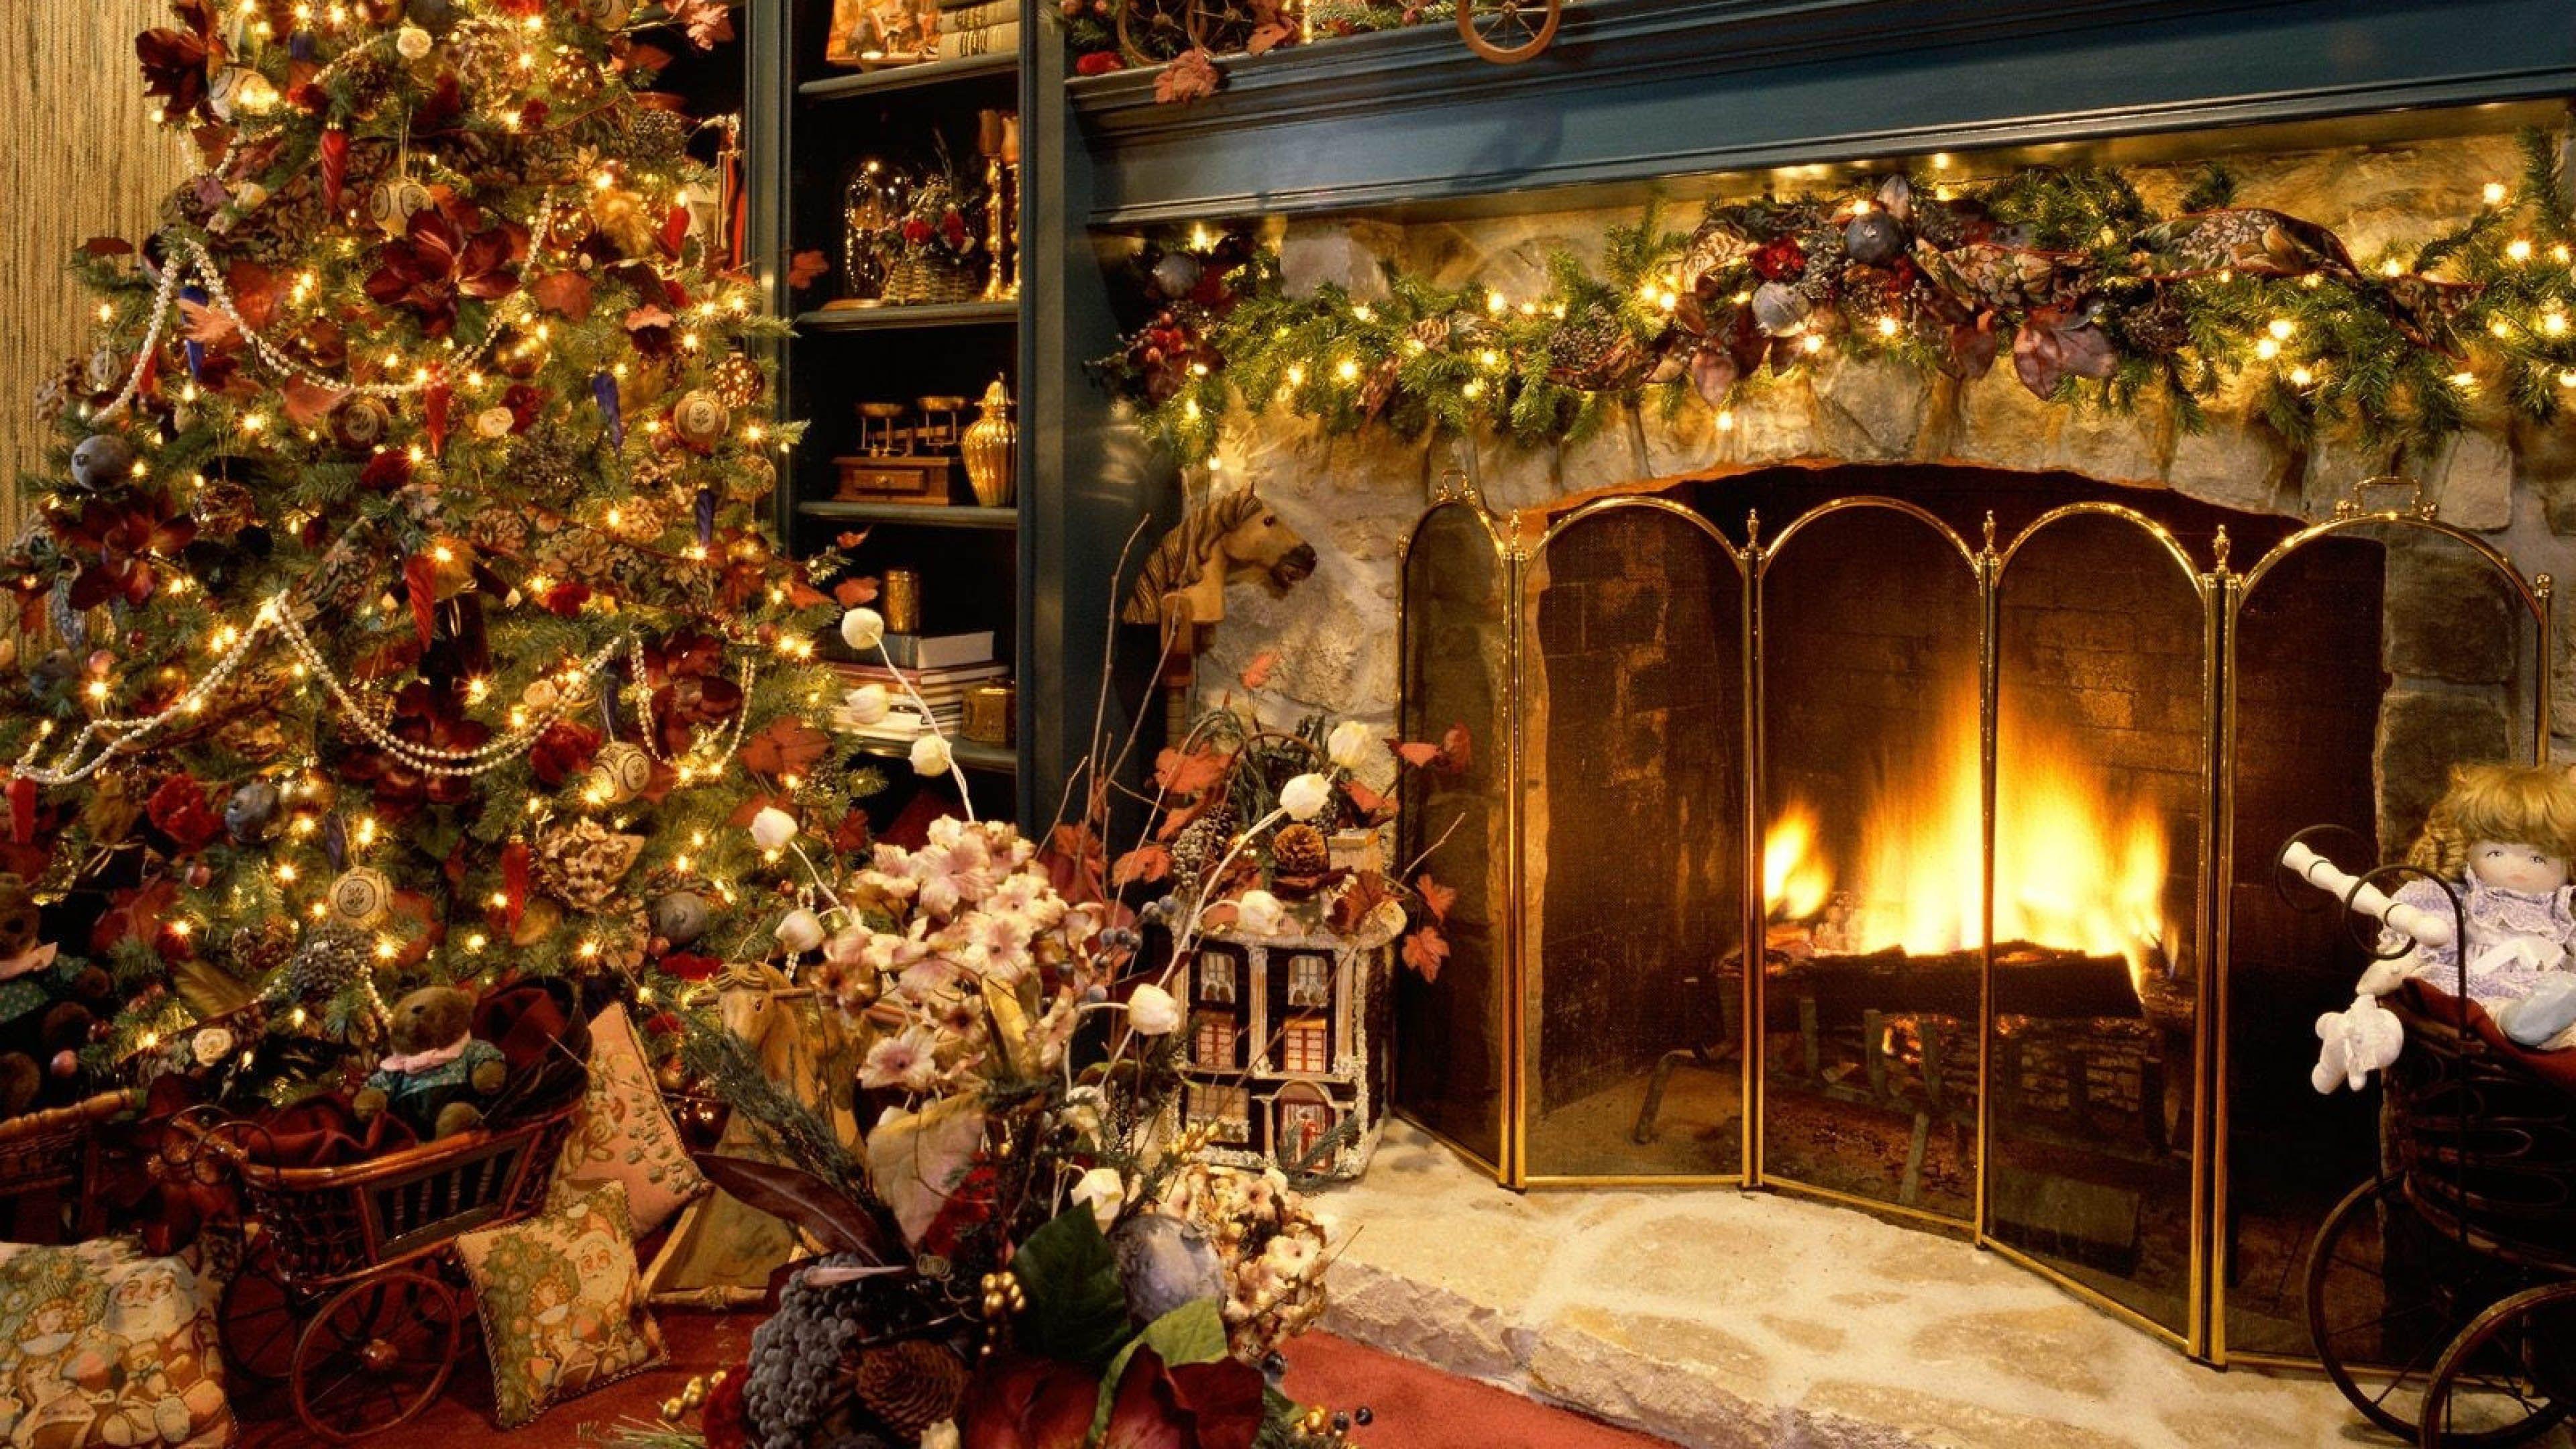 Christmas Fireplace 3840x2160 Wallpaper Christmas Tree And Fireplace Christmas Fireplace Beautiful Christmas Trees